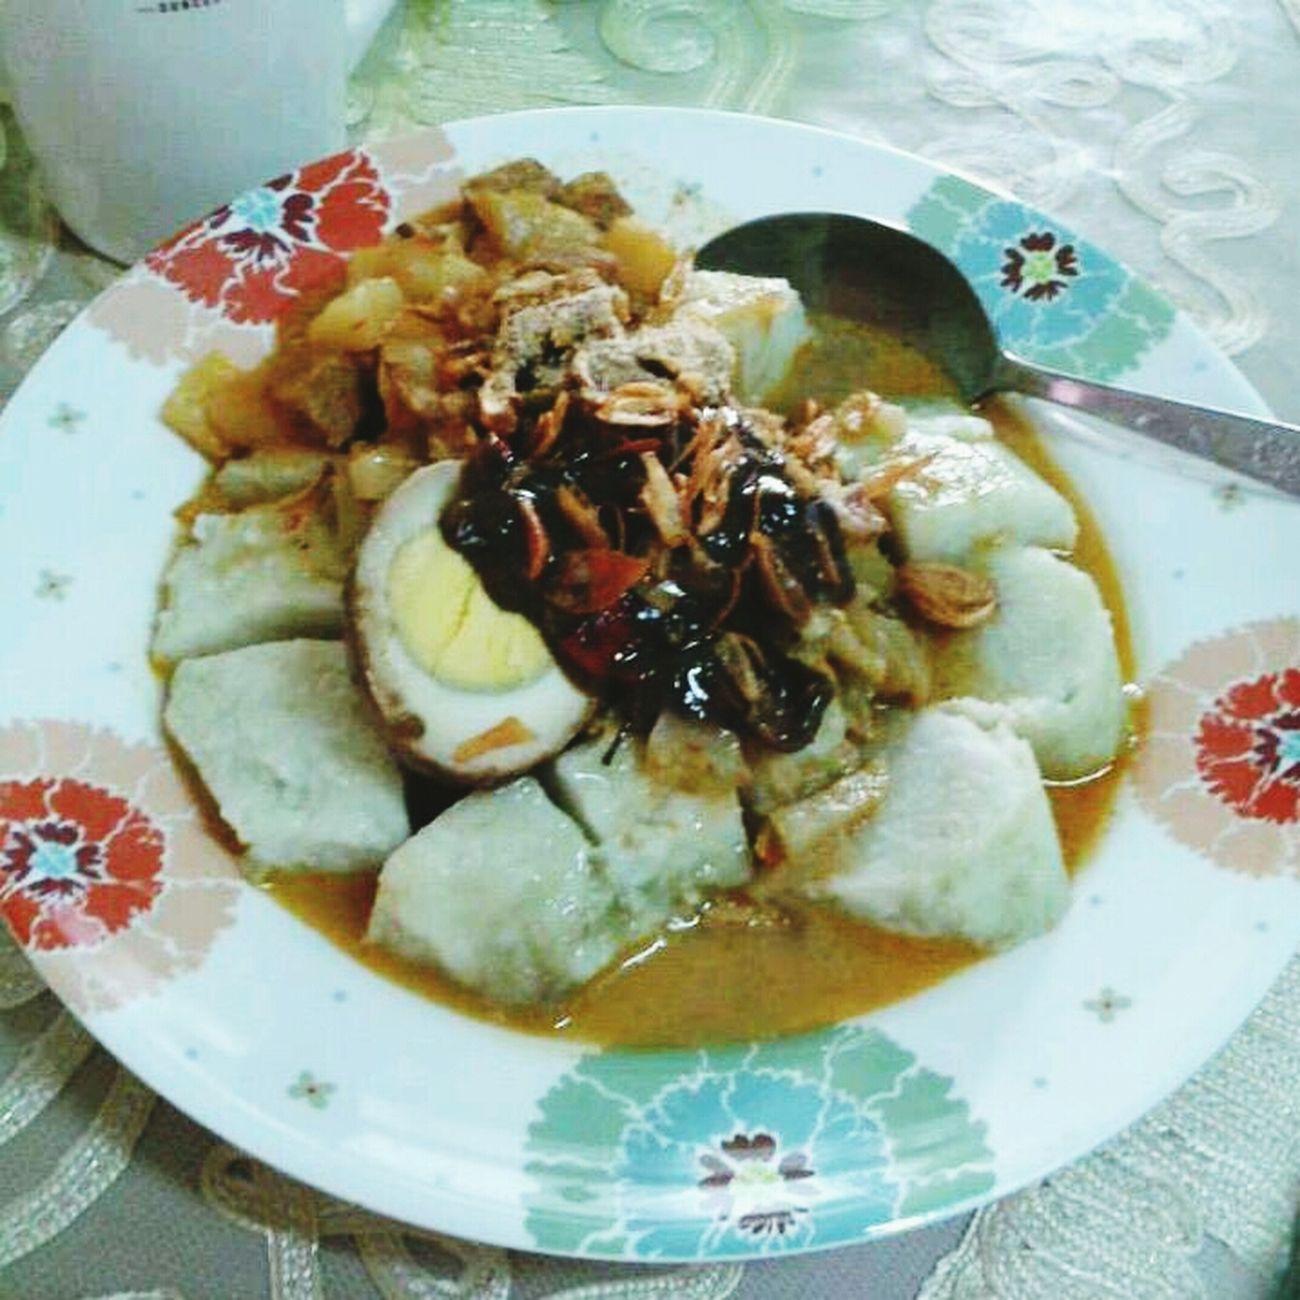 miss 'lontong sayur'.. my village food.... Hello World Enjoying A Meal